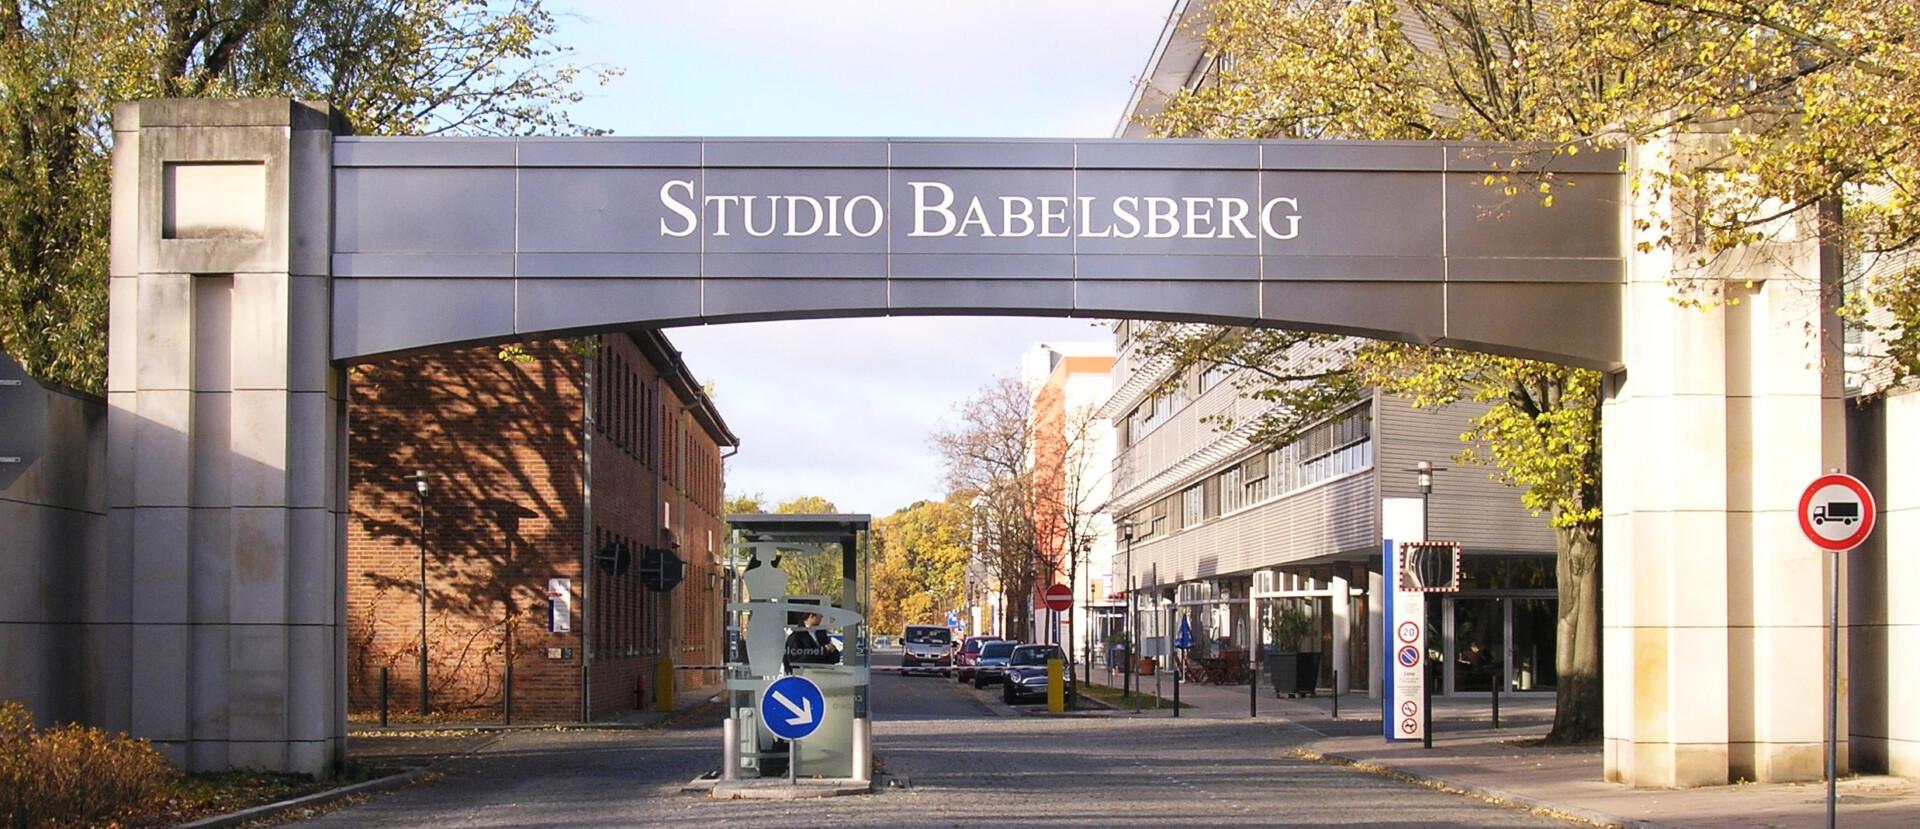 Studio Babelsberg, Foto: PMSG/ André Stiebitz